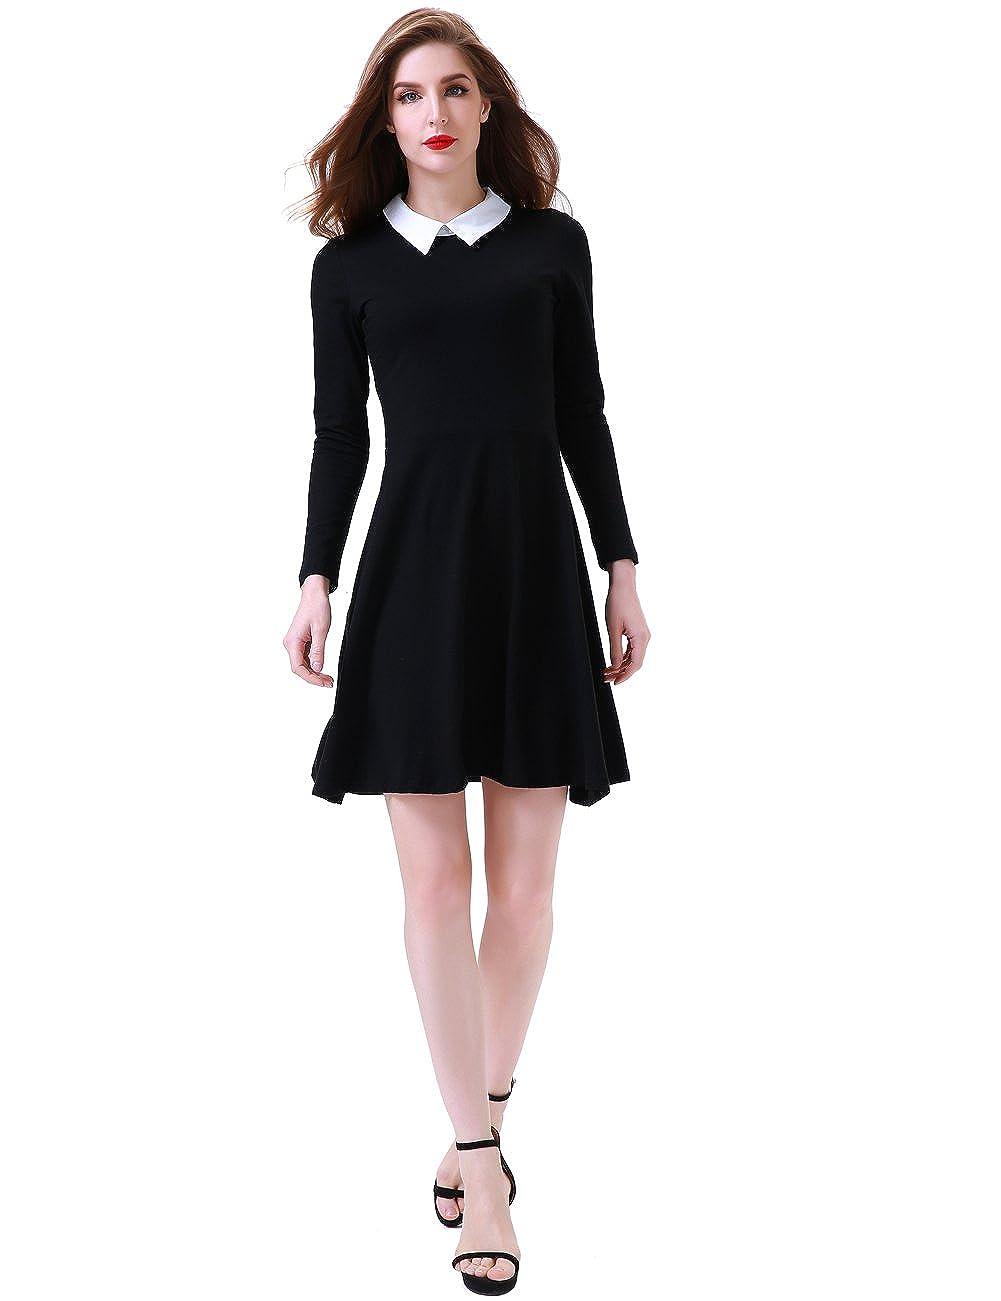 Aphratti Women's Long Sleeve Casual Shirt Peter Pan Collar Flare Dress JT207-002